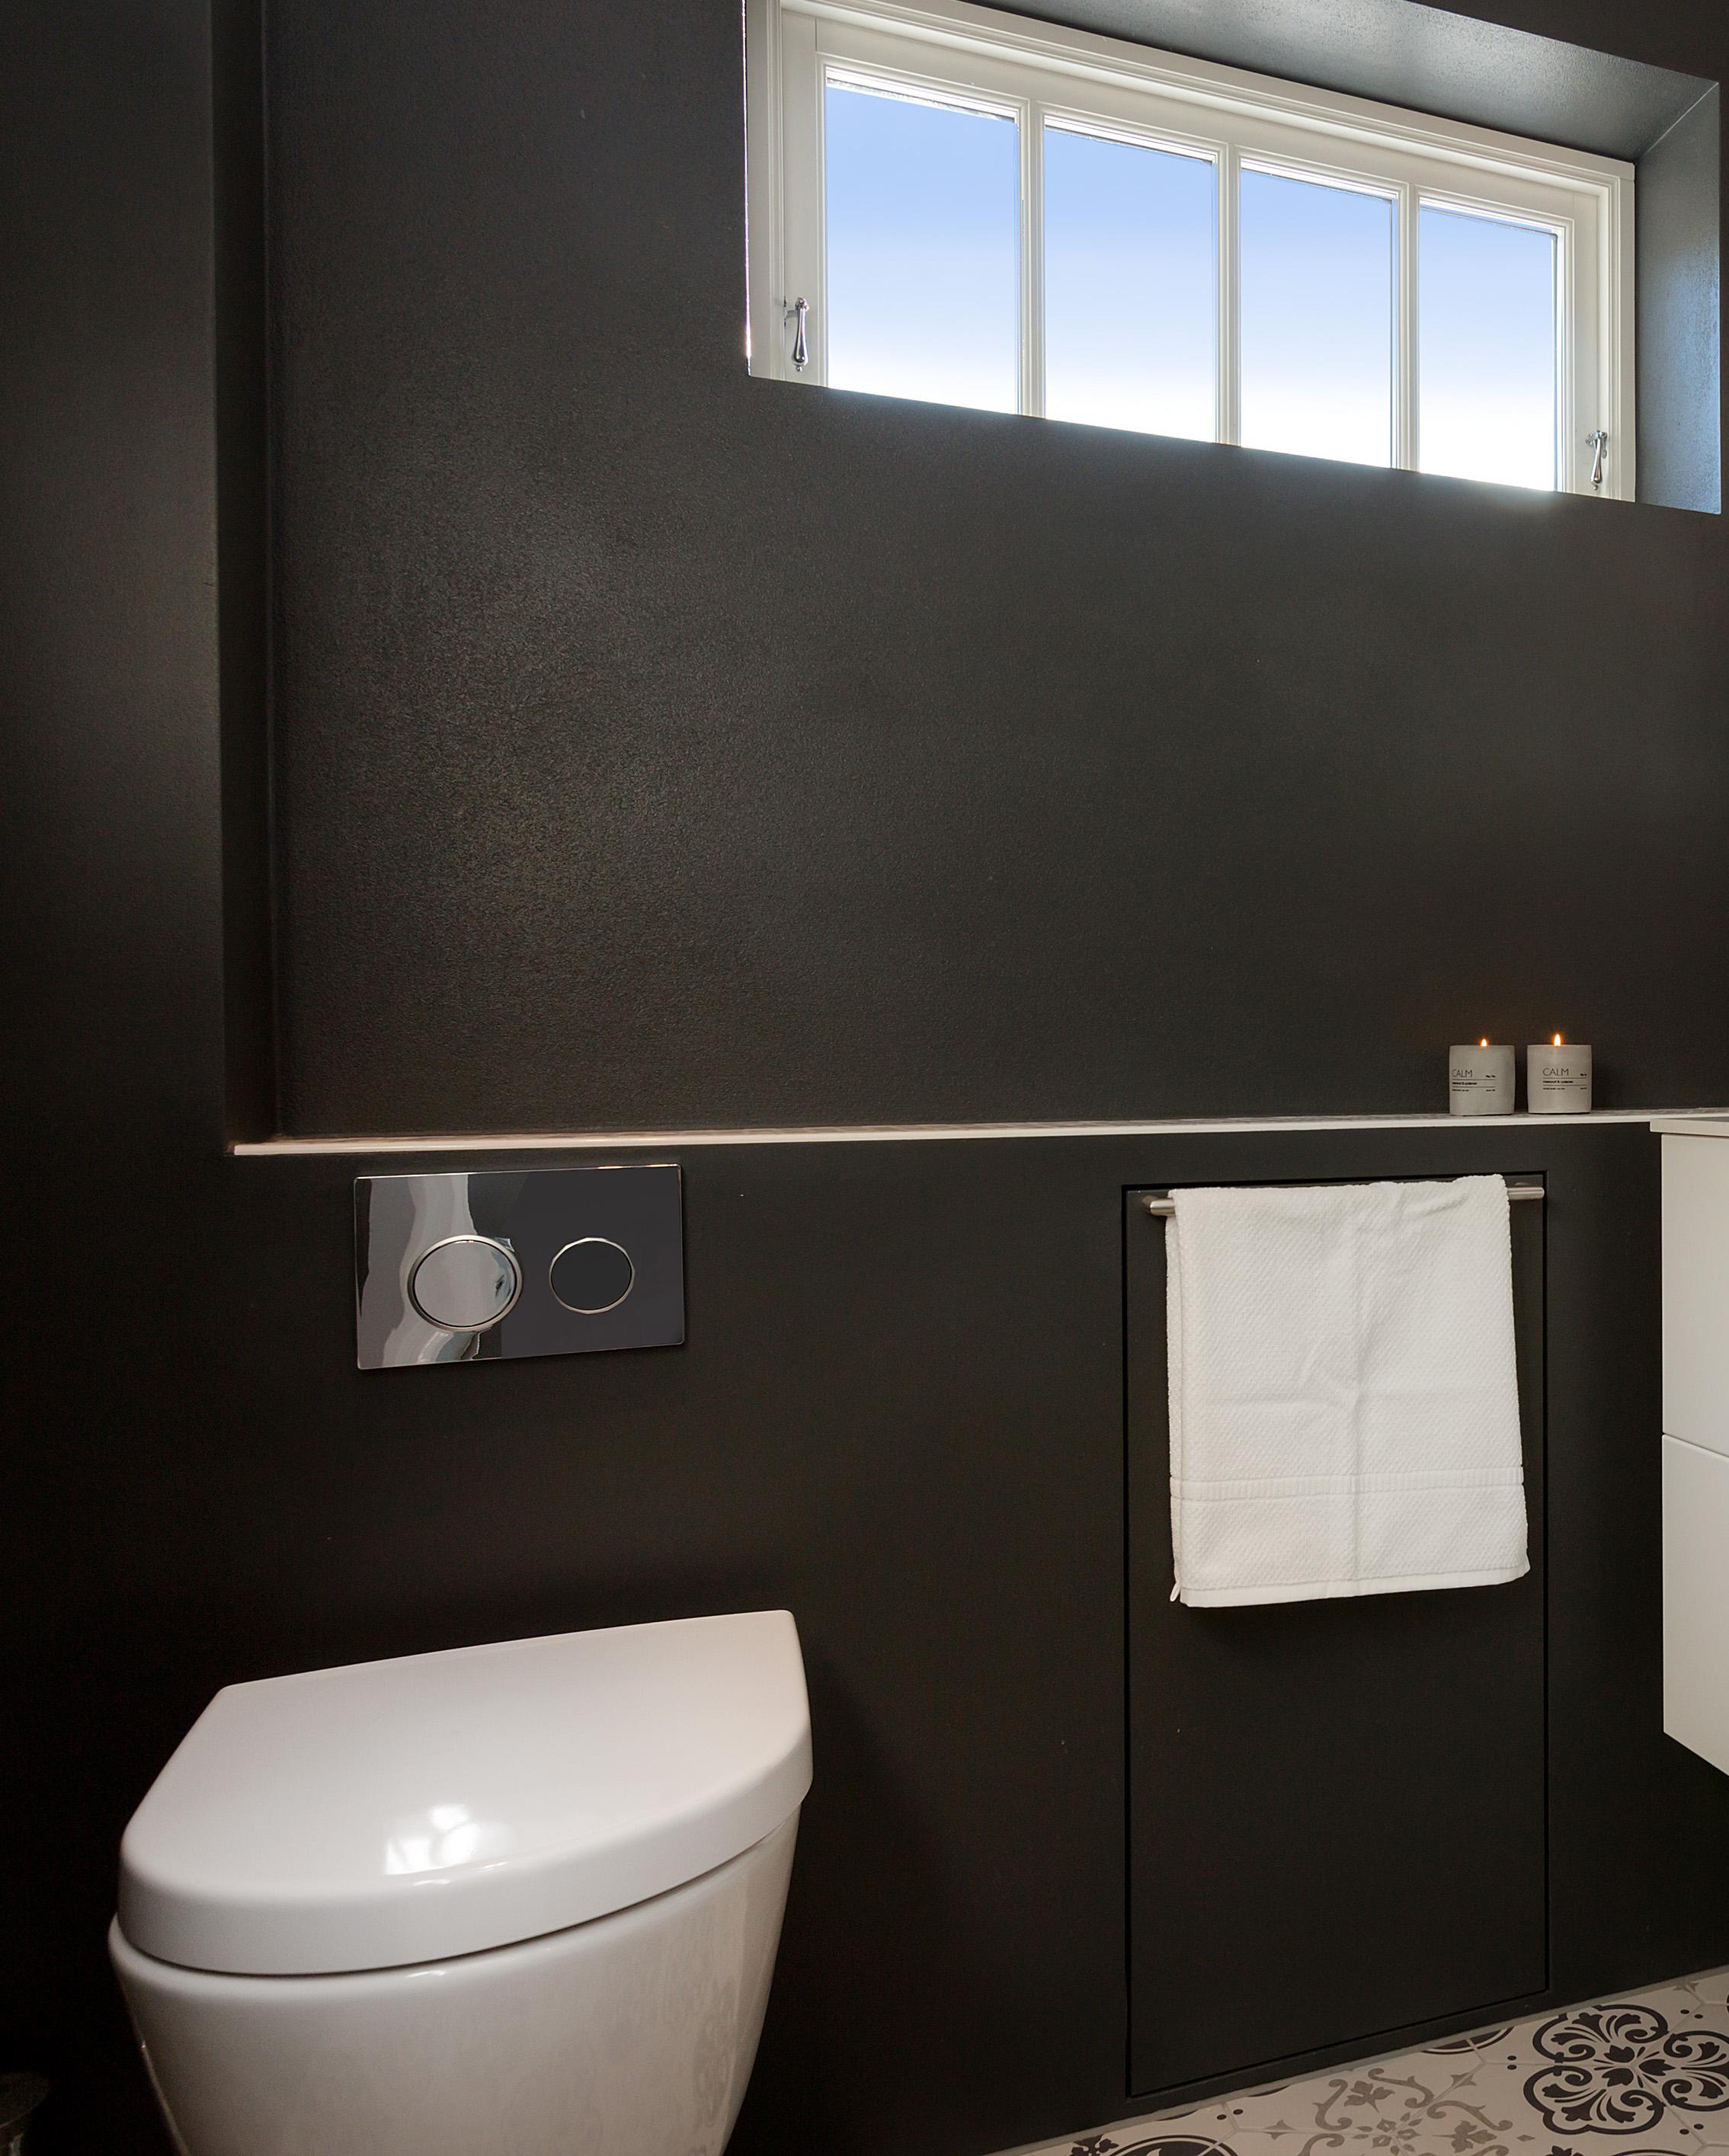 bad 5 vegghengt toalett interiør.jpg